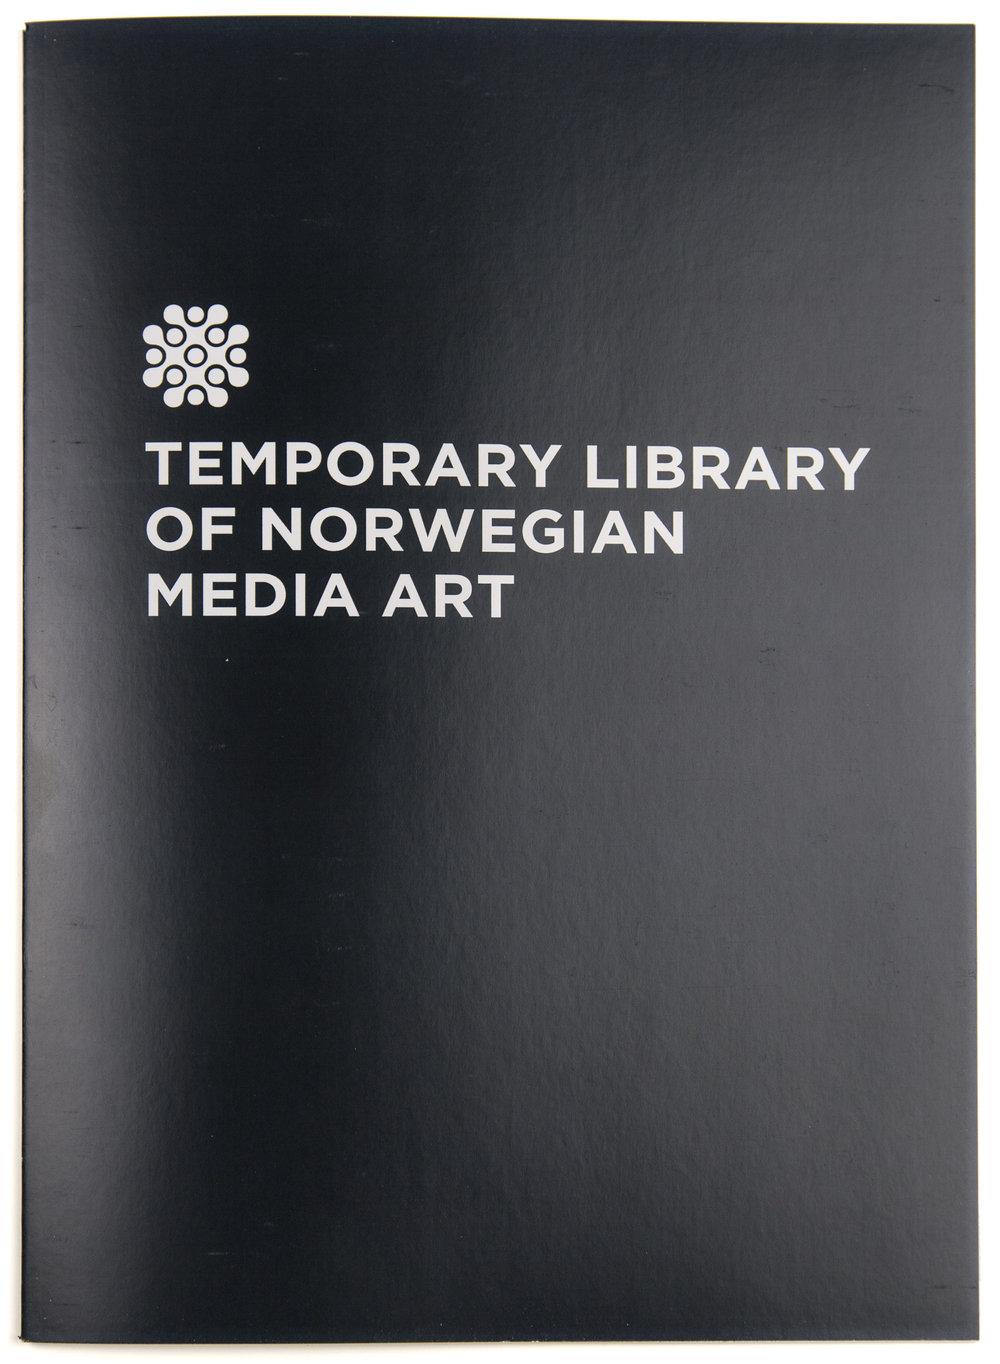 Temporary Library of Norwegian Media Art: Norwegian Media Art in Print 1992 - 2018   Zane Cerpina, Espen Gangvik, Alessandro Ludovico, Stahl Stenslie (eds.). TEKS Publishing, 2018. ISBN: 978-82-998211-8-6 temporarylibrary.no